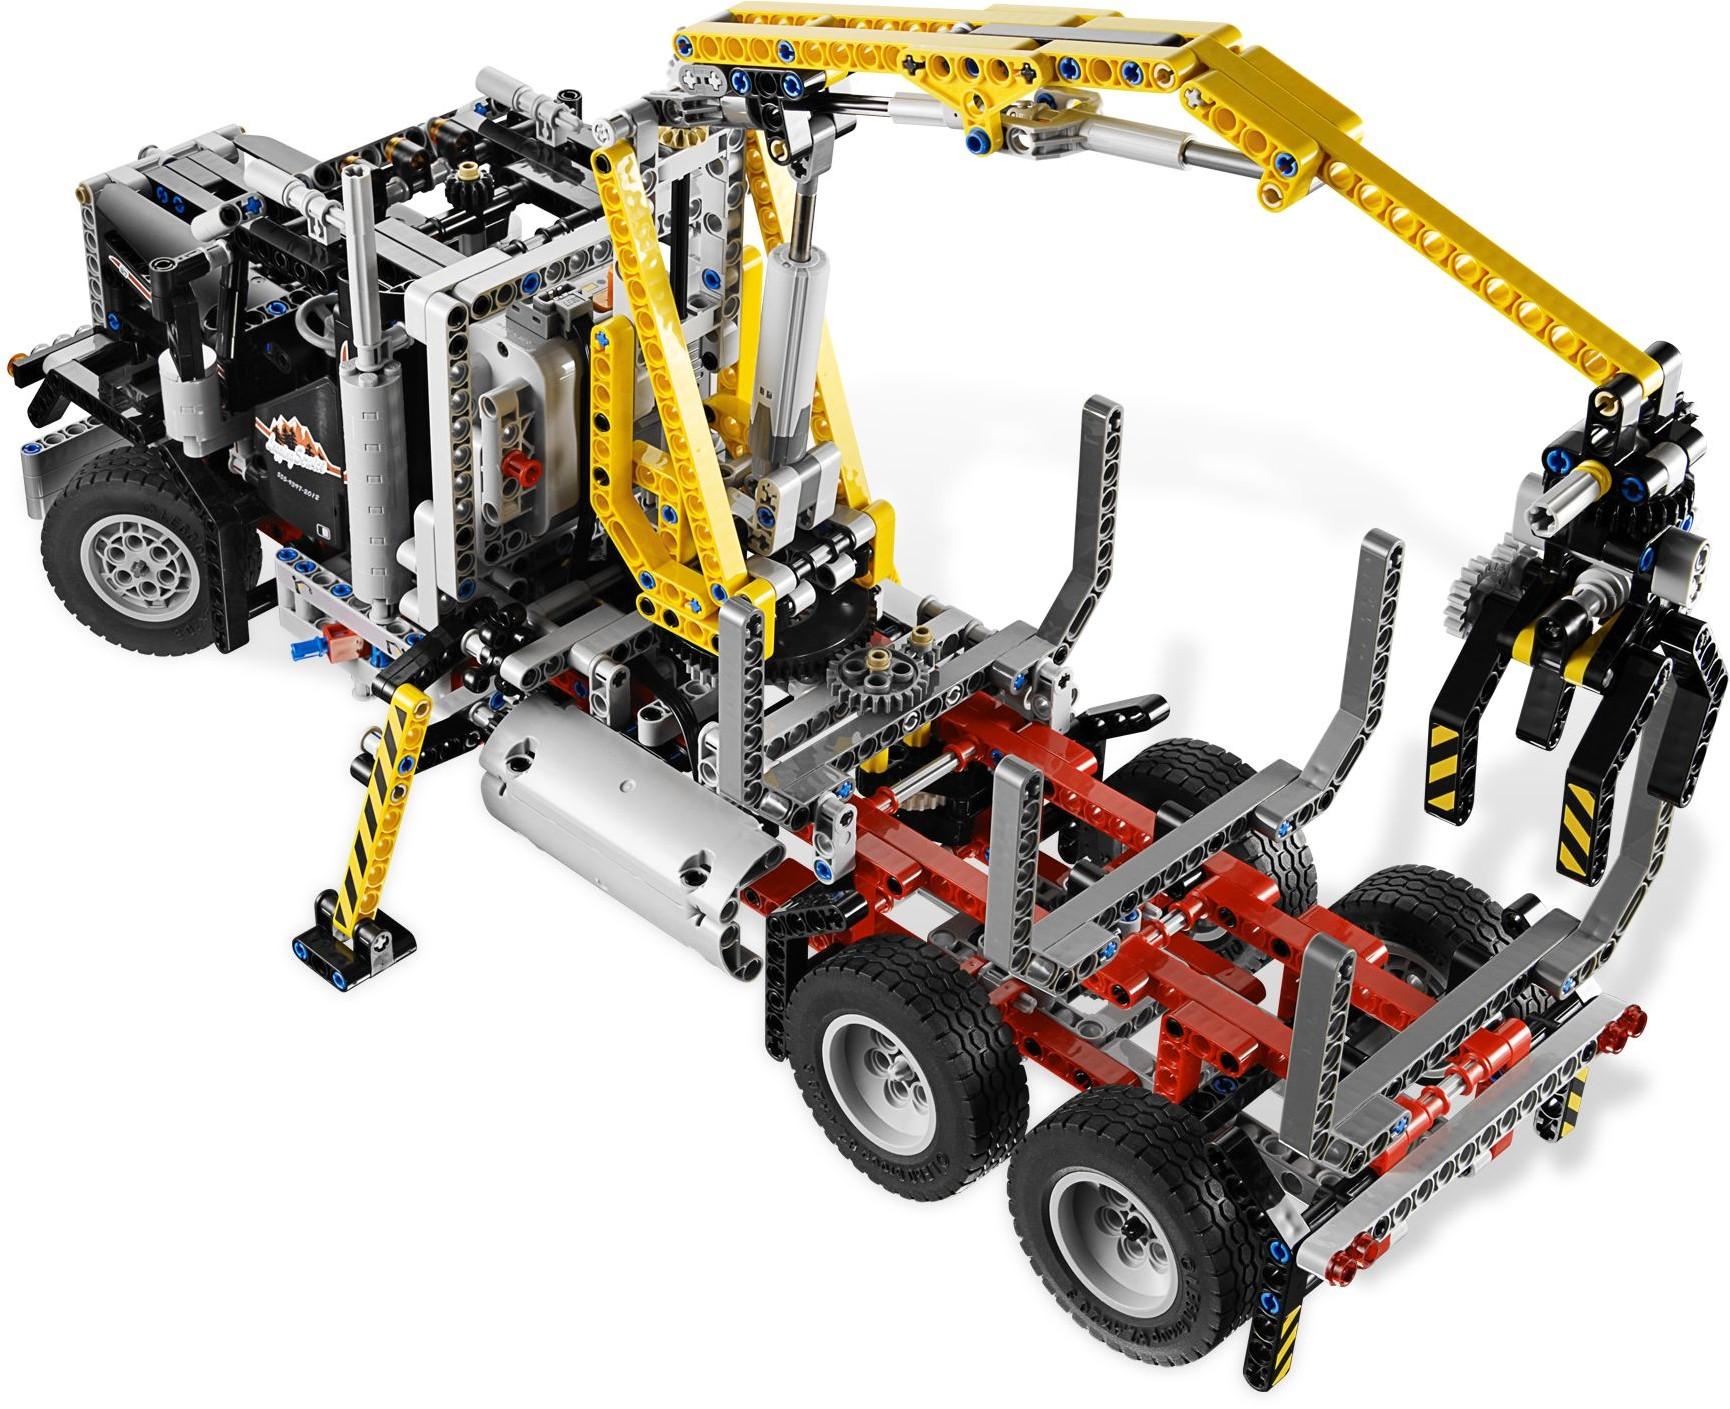 lego technic 9397 pas cher le camion forestier. Black Bedroom Furniture Sets. Home Design Ideas